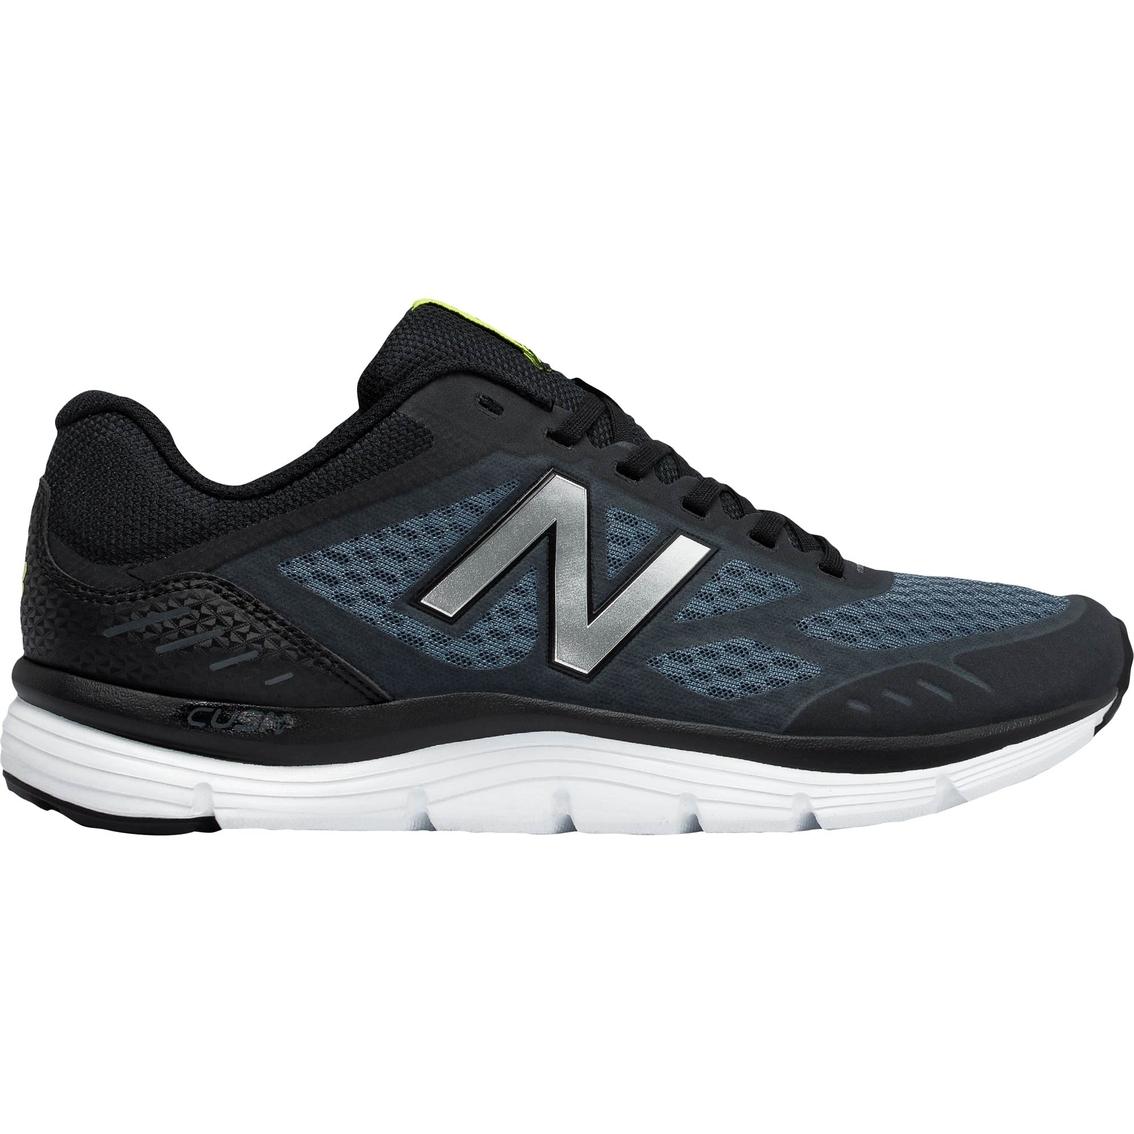 New Balance Men\u0027s M775LT3 Running Shoes